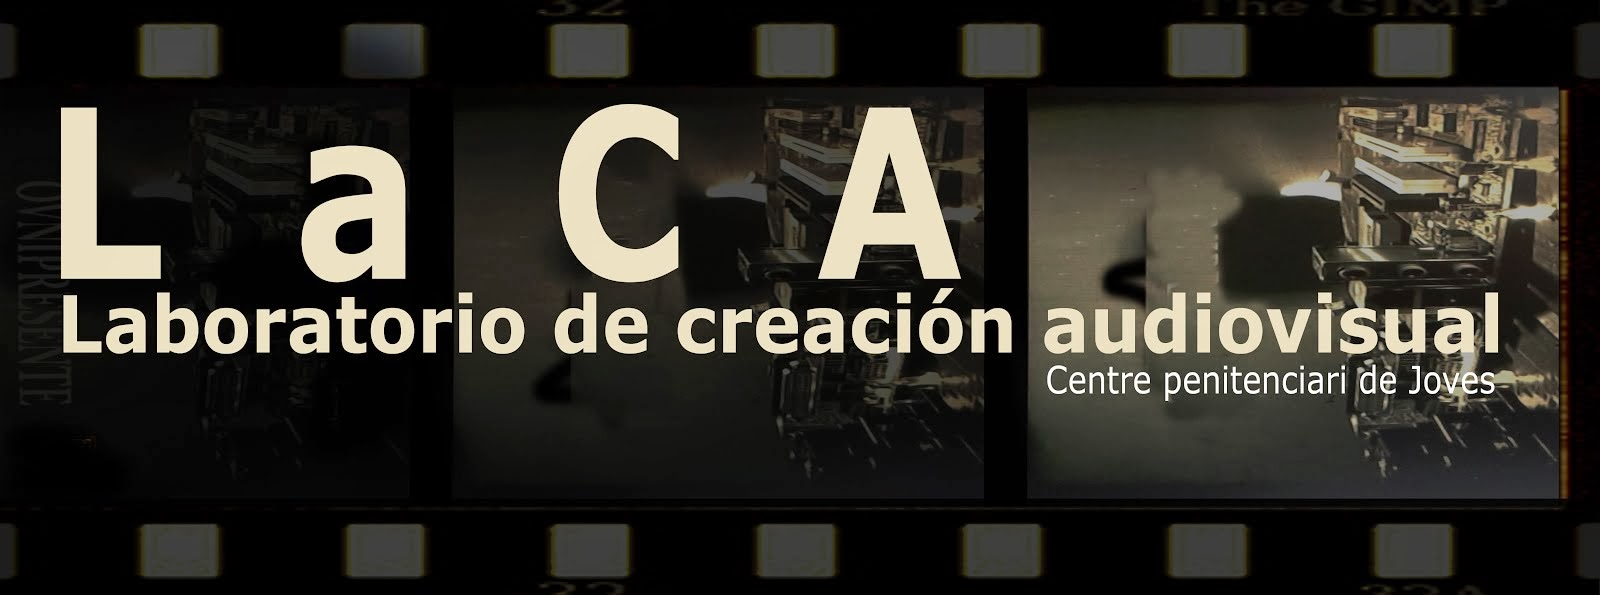 Laboratorio de Creación Audiovisual